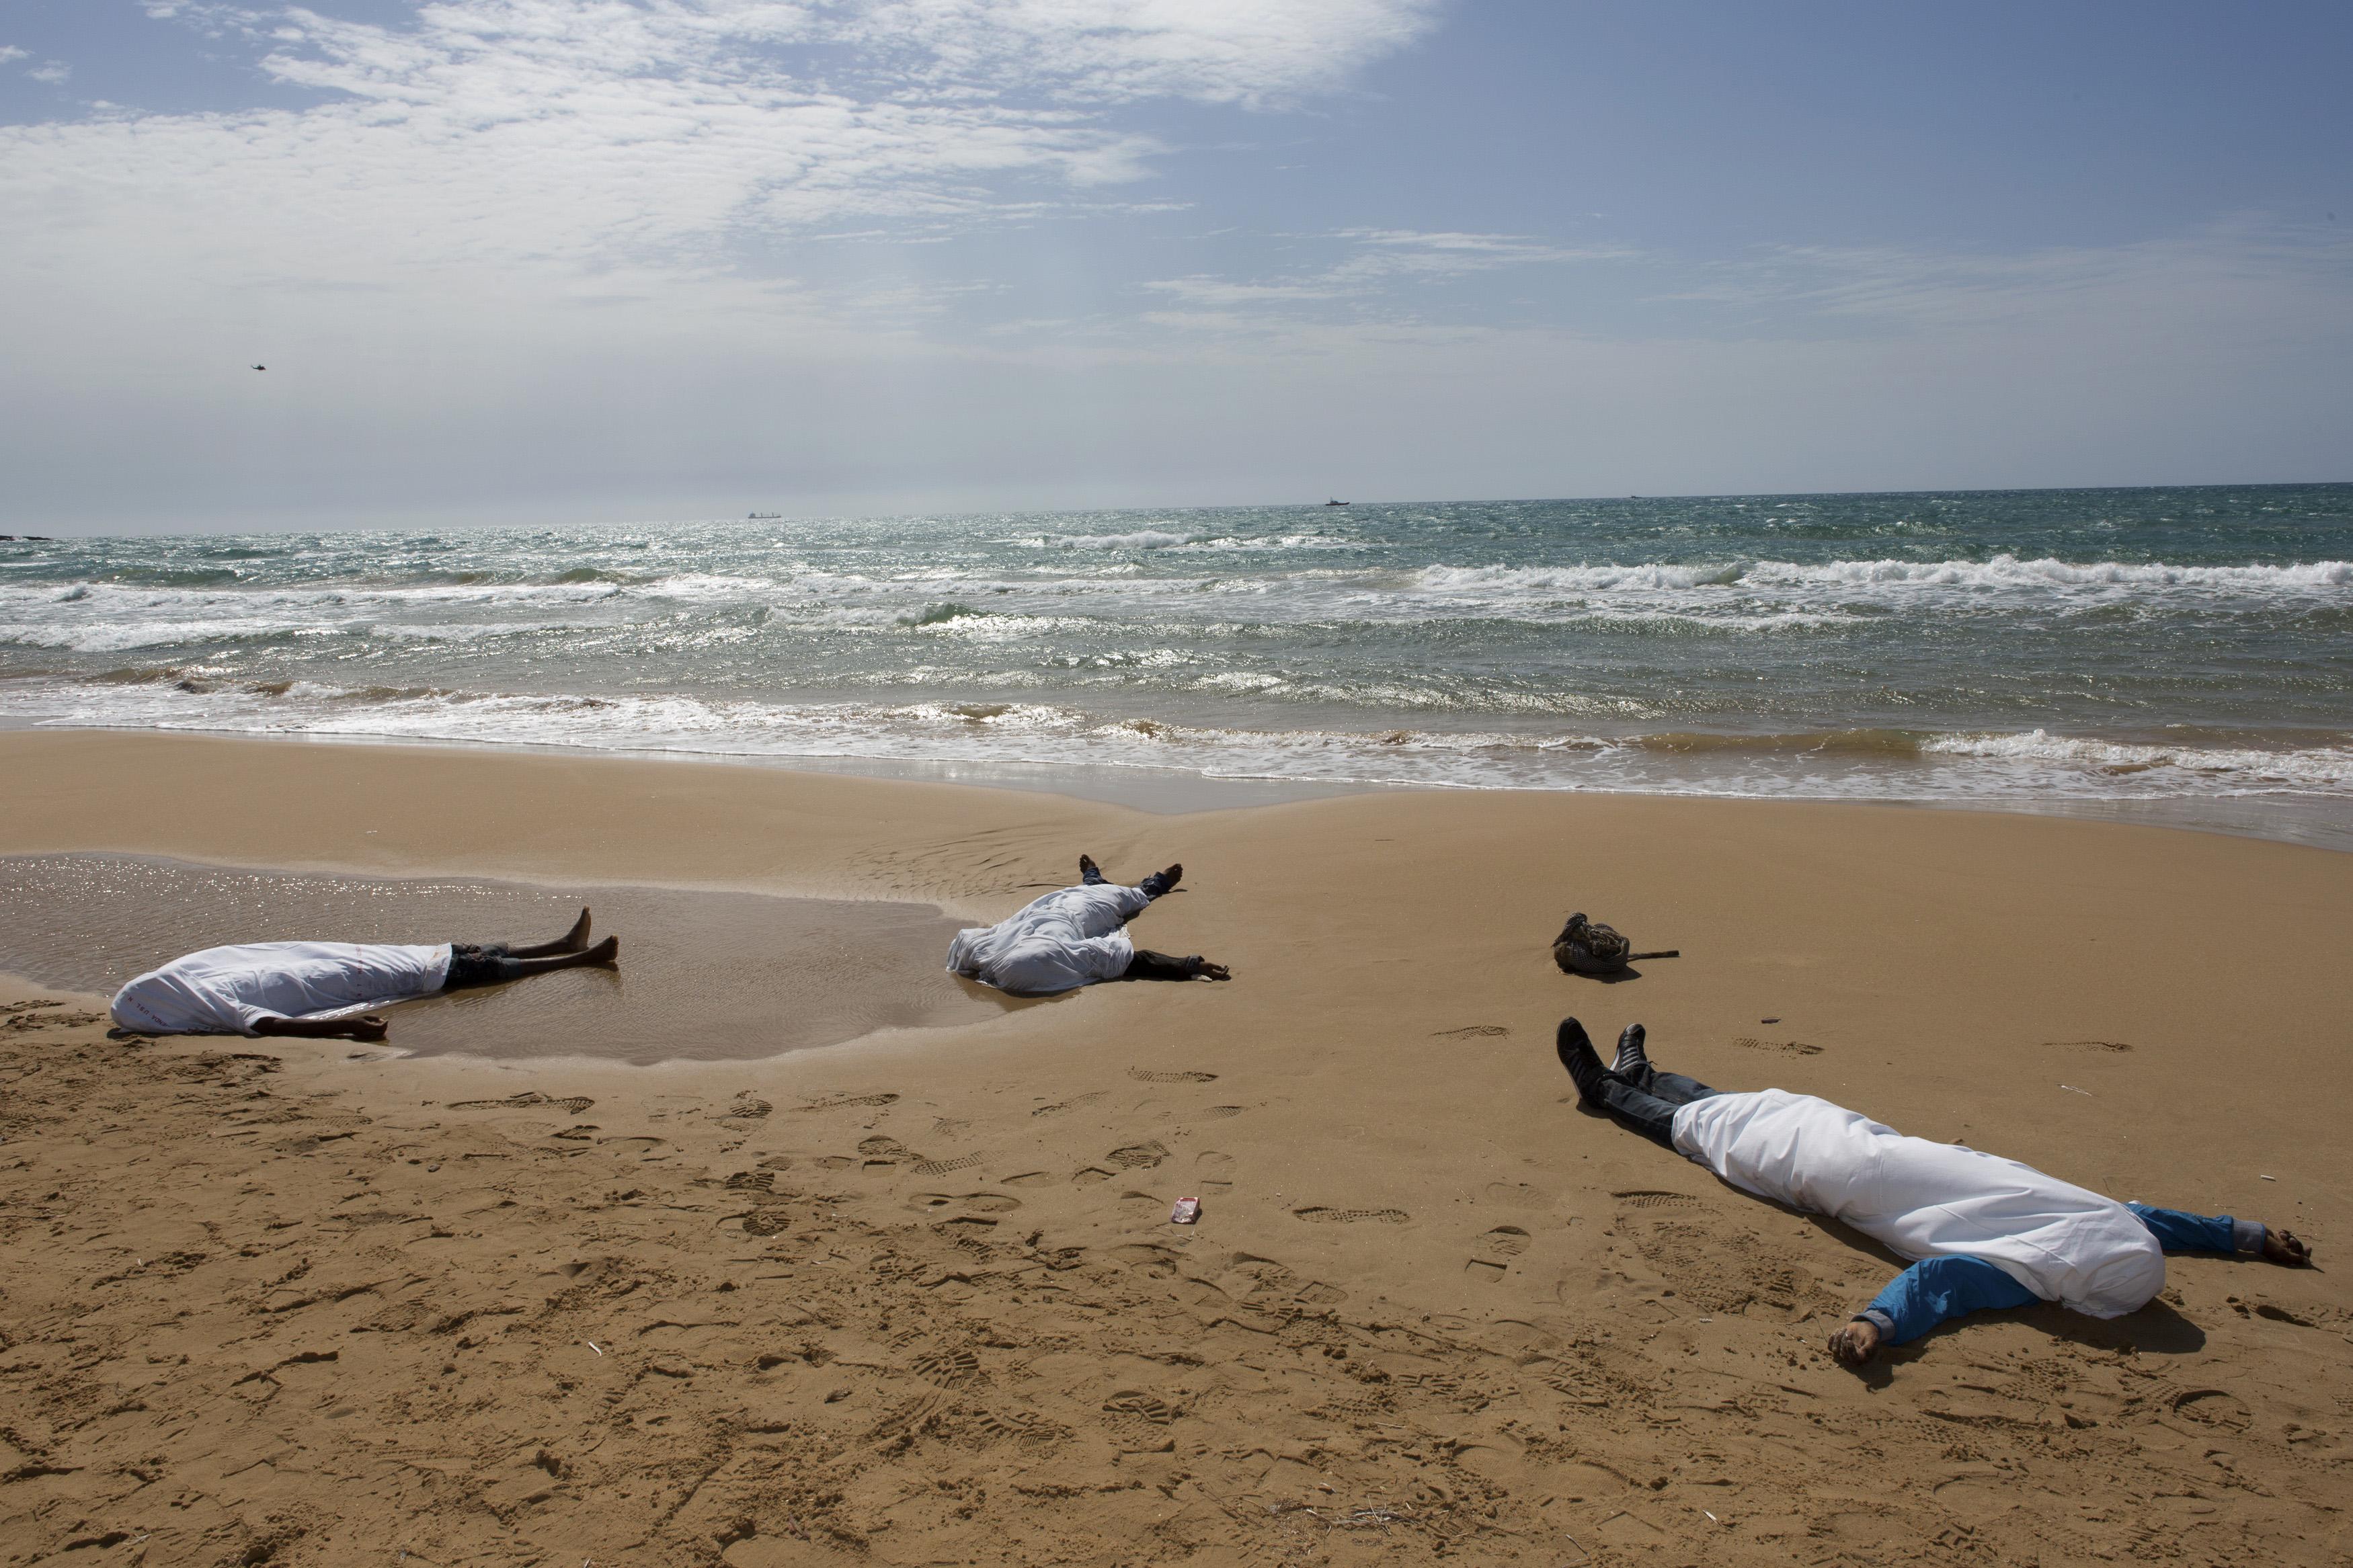 Des immigrants morts le long de la côte.  [Reuters]